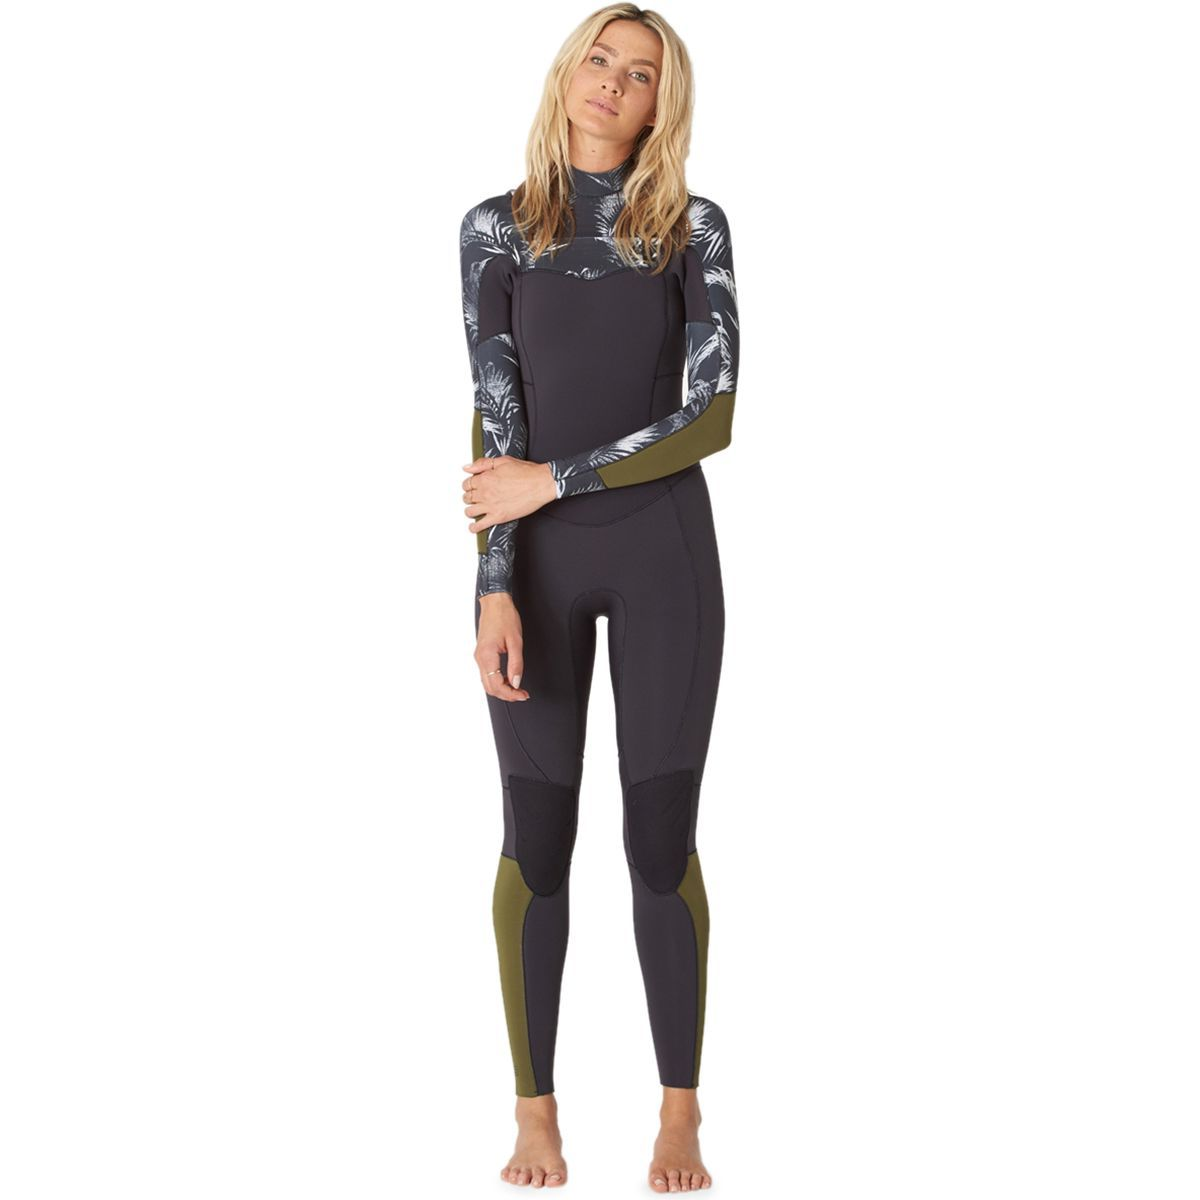 Billabong Surf Capsule Salty Dayz 3/2 Full Suit - Women's